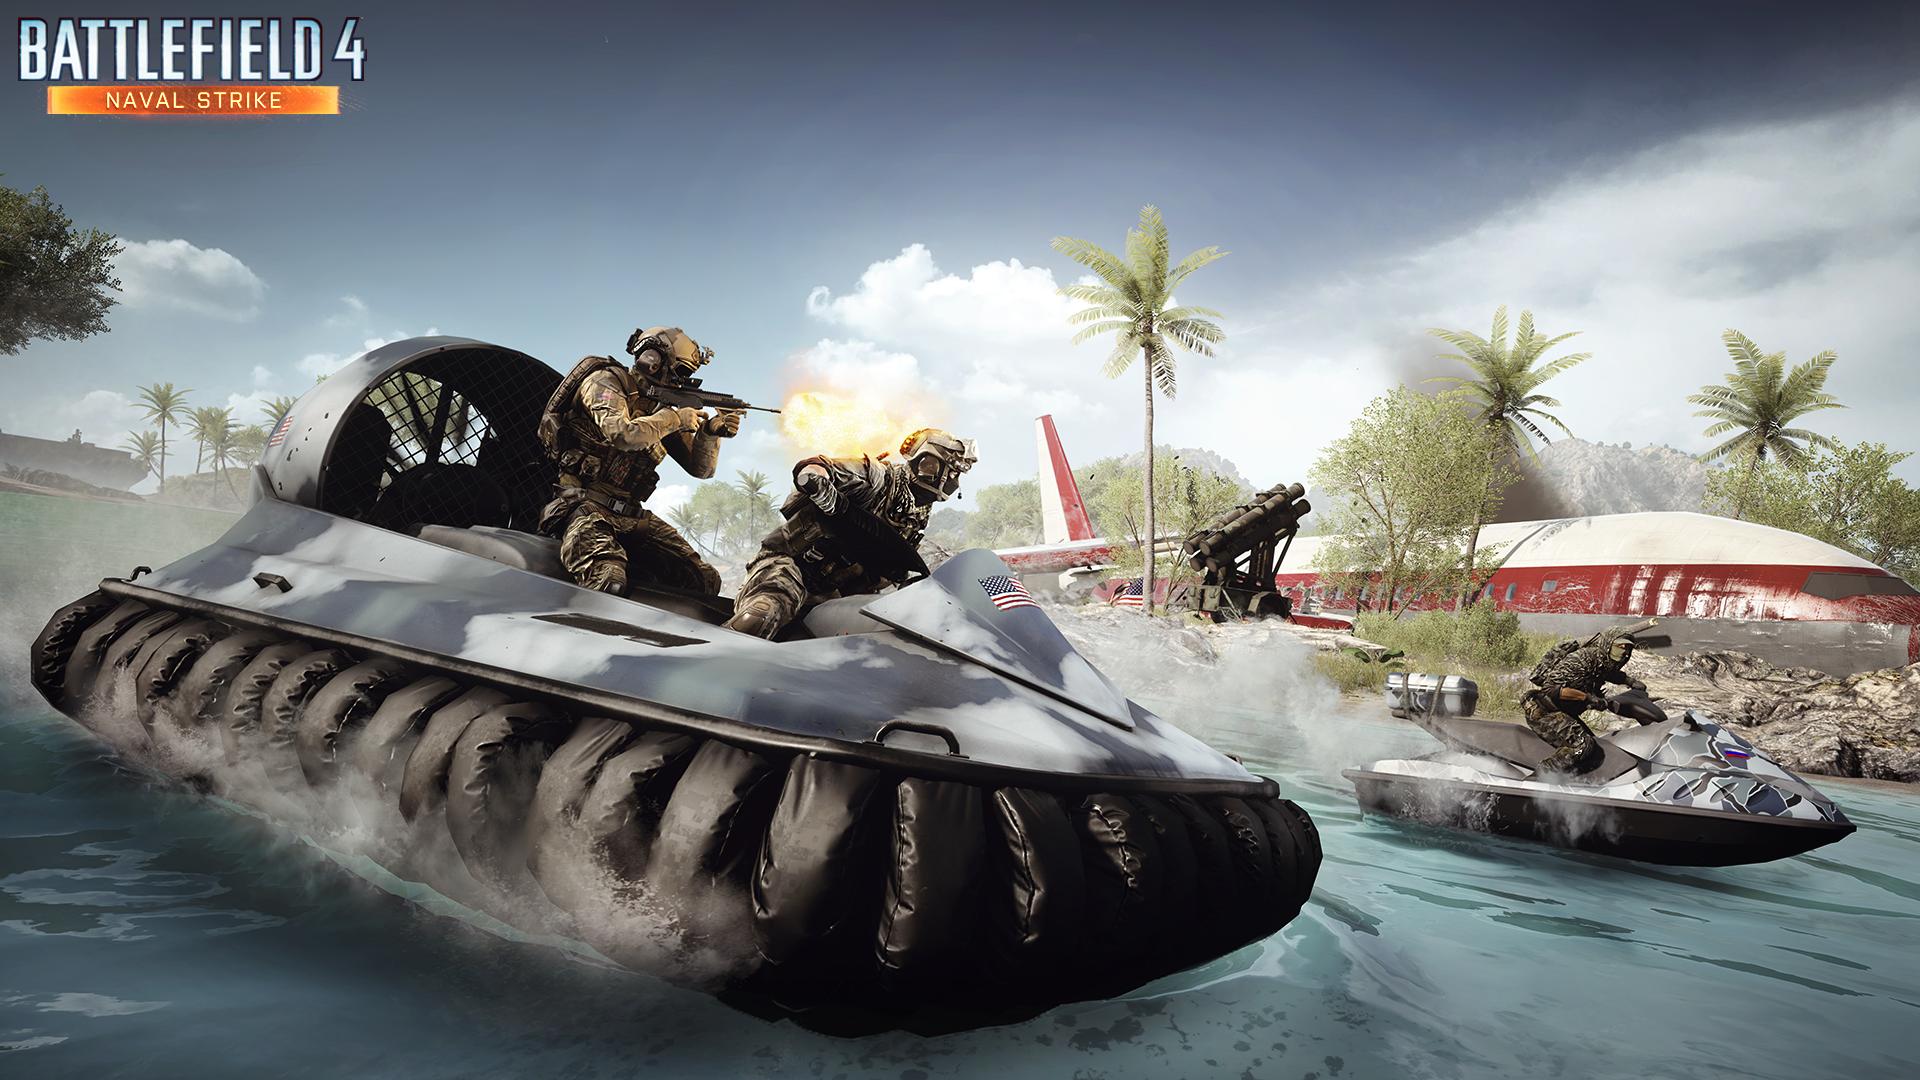 Battlefield 4 – Naval Strike